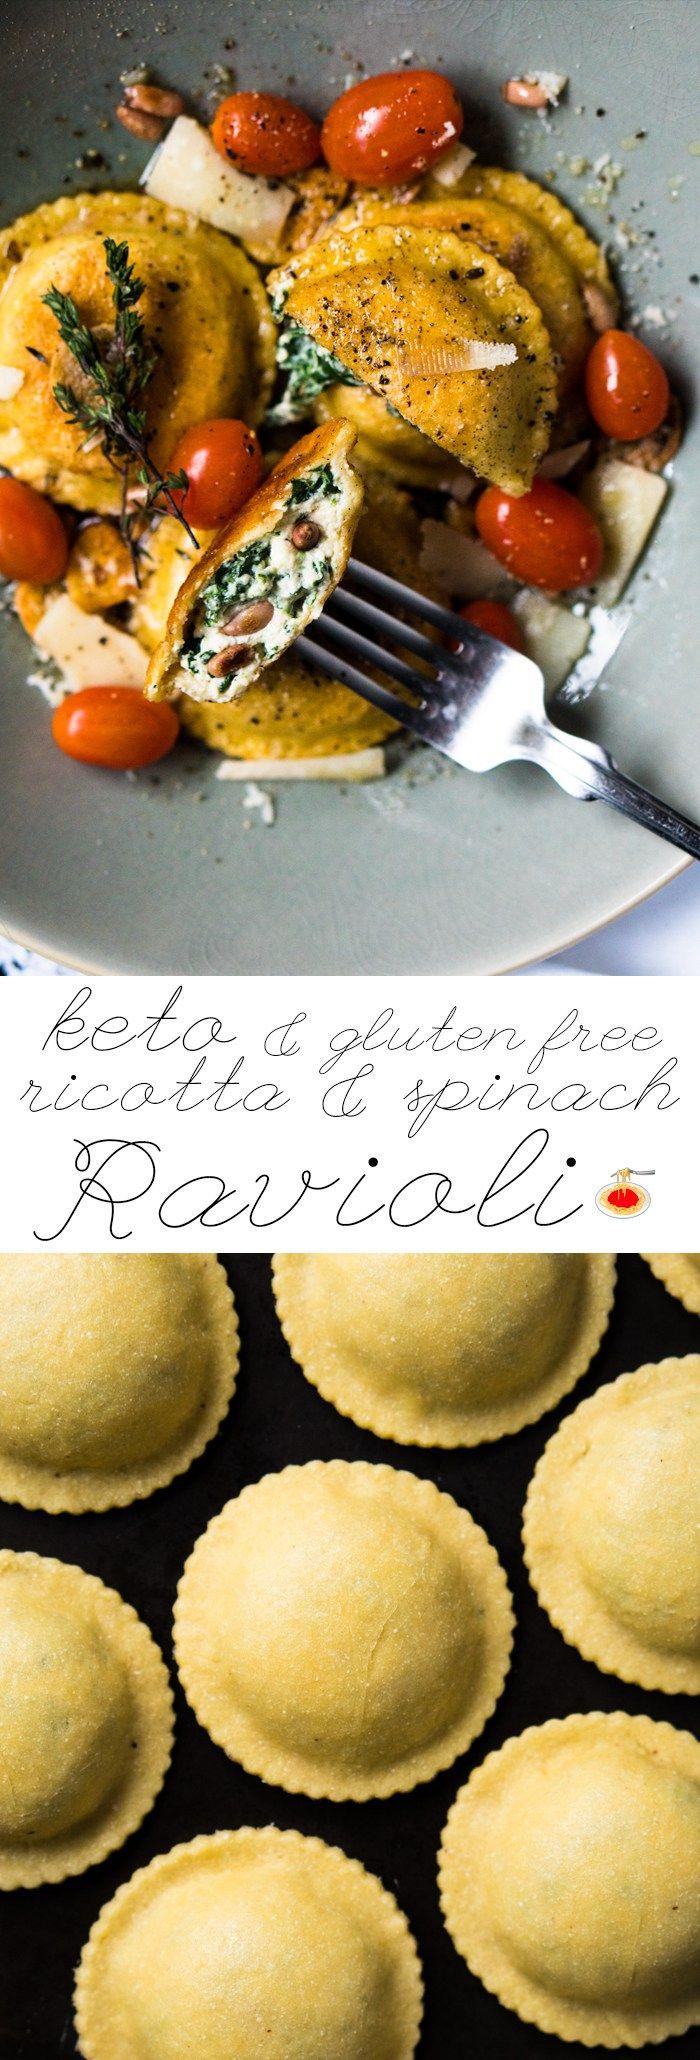 http://www.gnom-gnom.com/spinach-ricotta-grain-free-keto-ravioli/